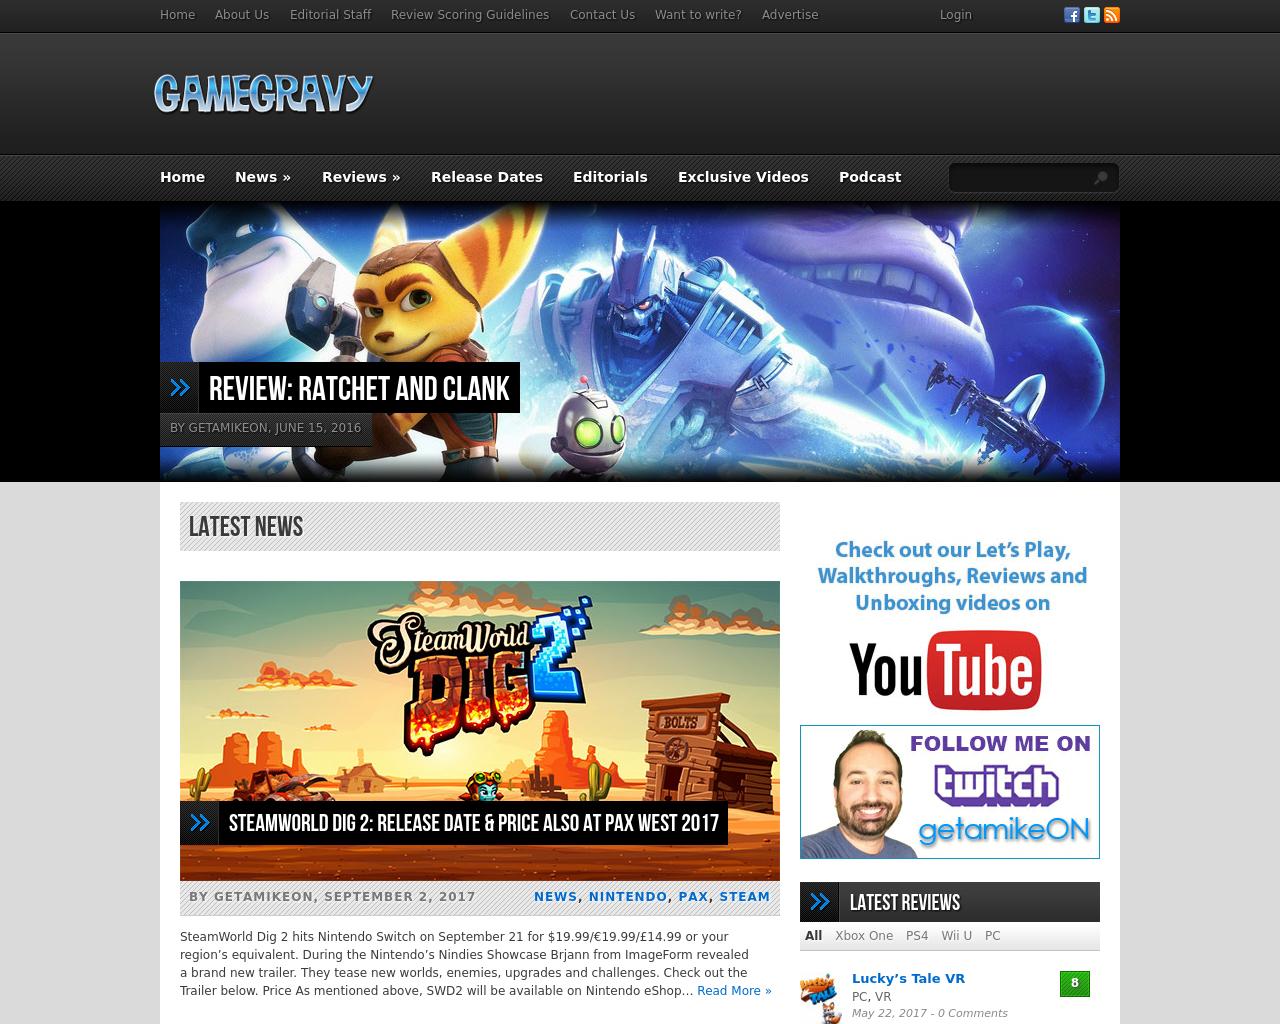 GAMEGRAVY-Advertising-Reviews-Pricing